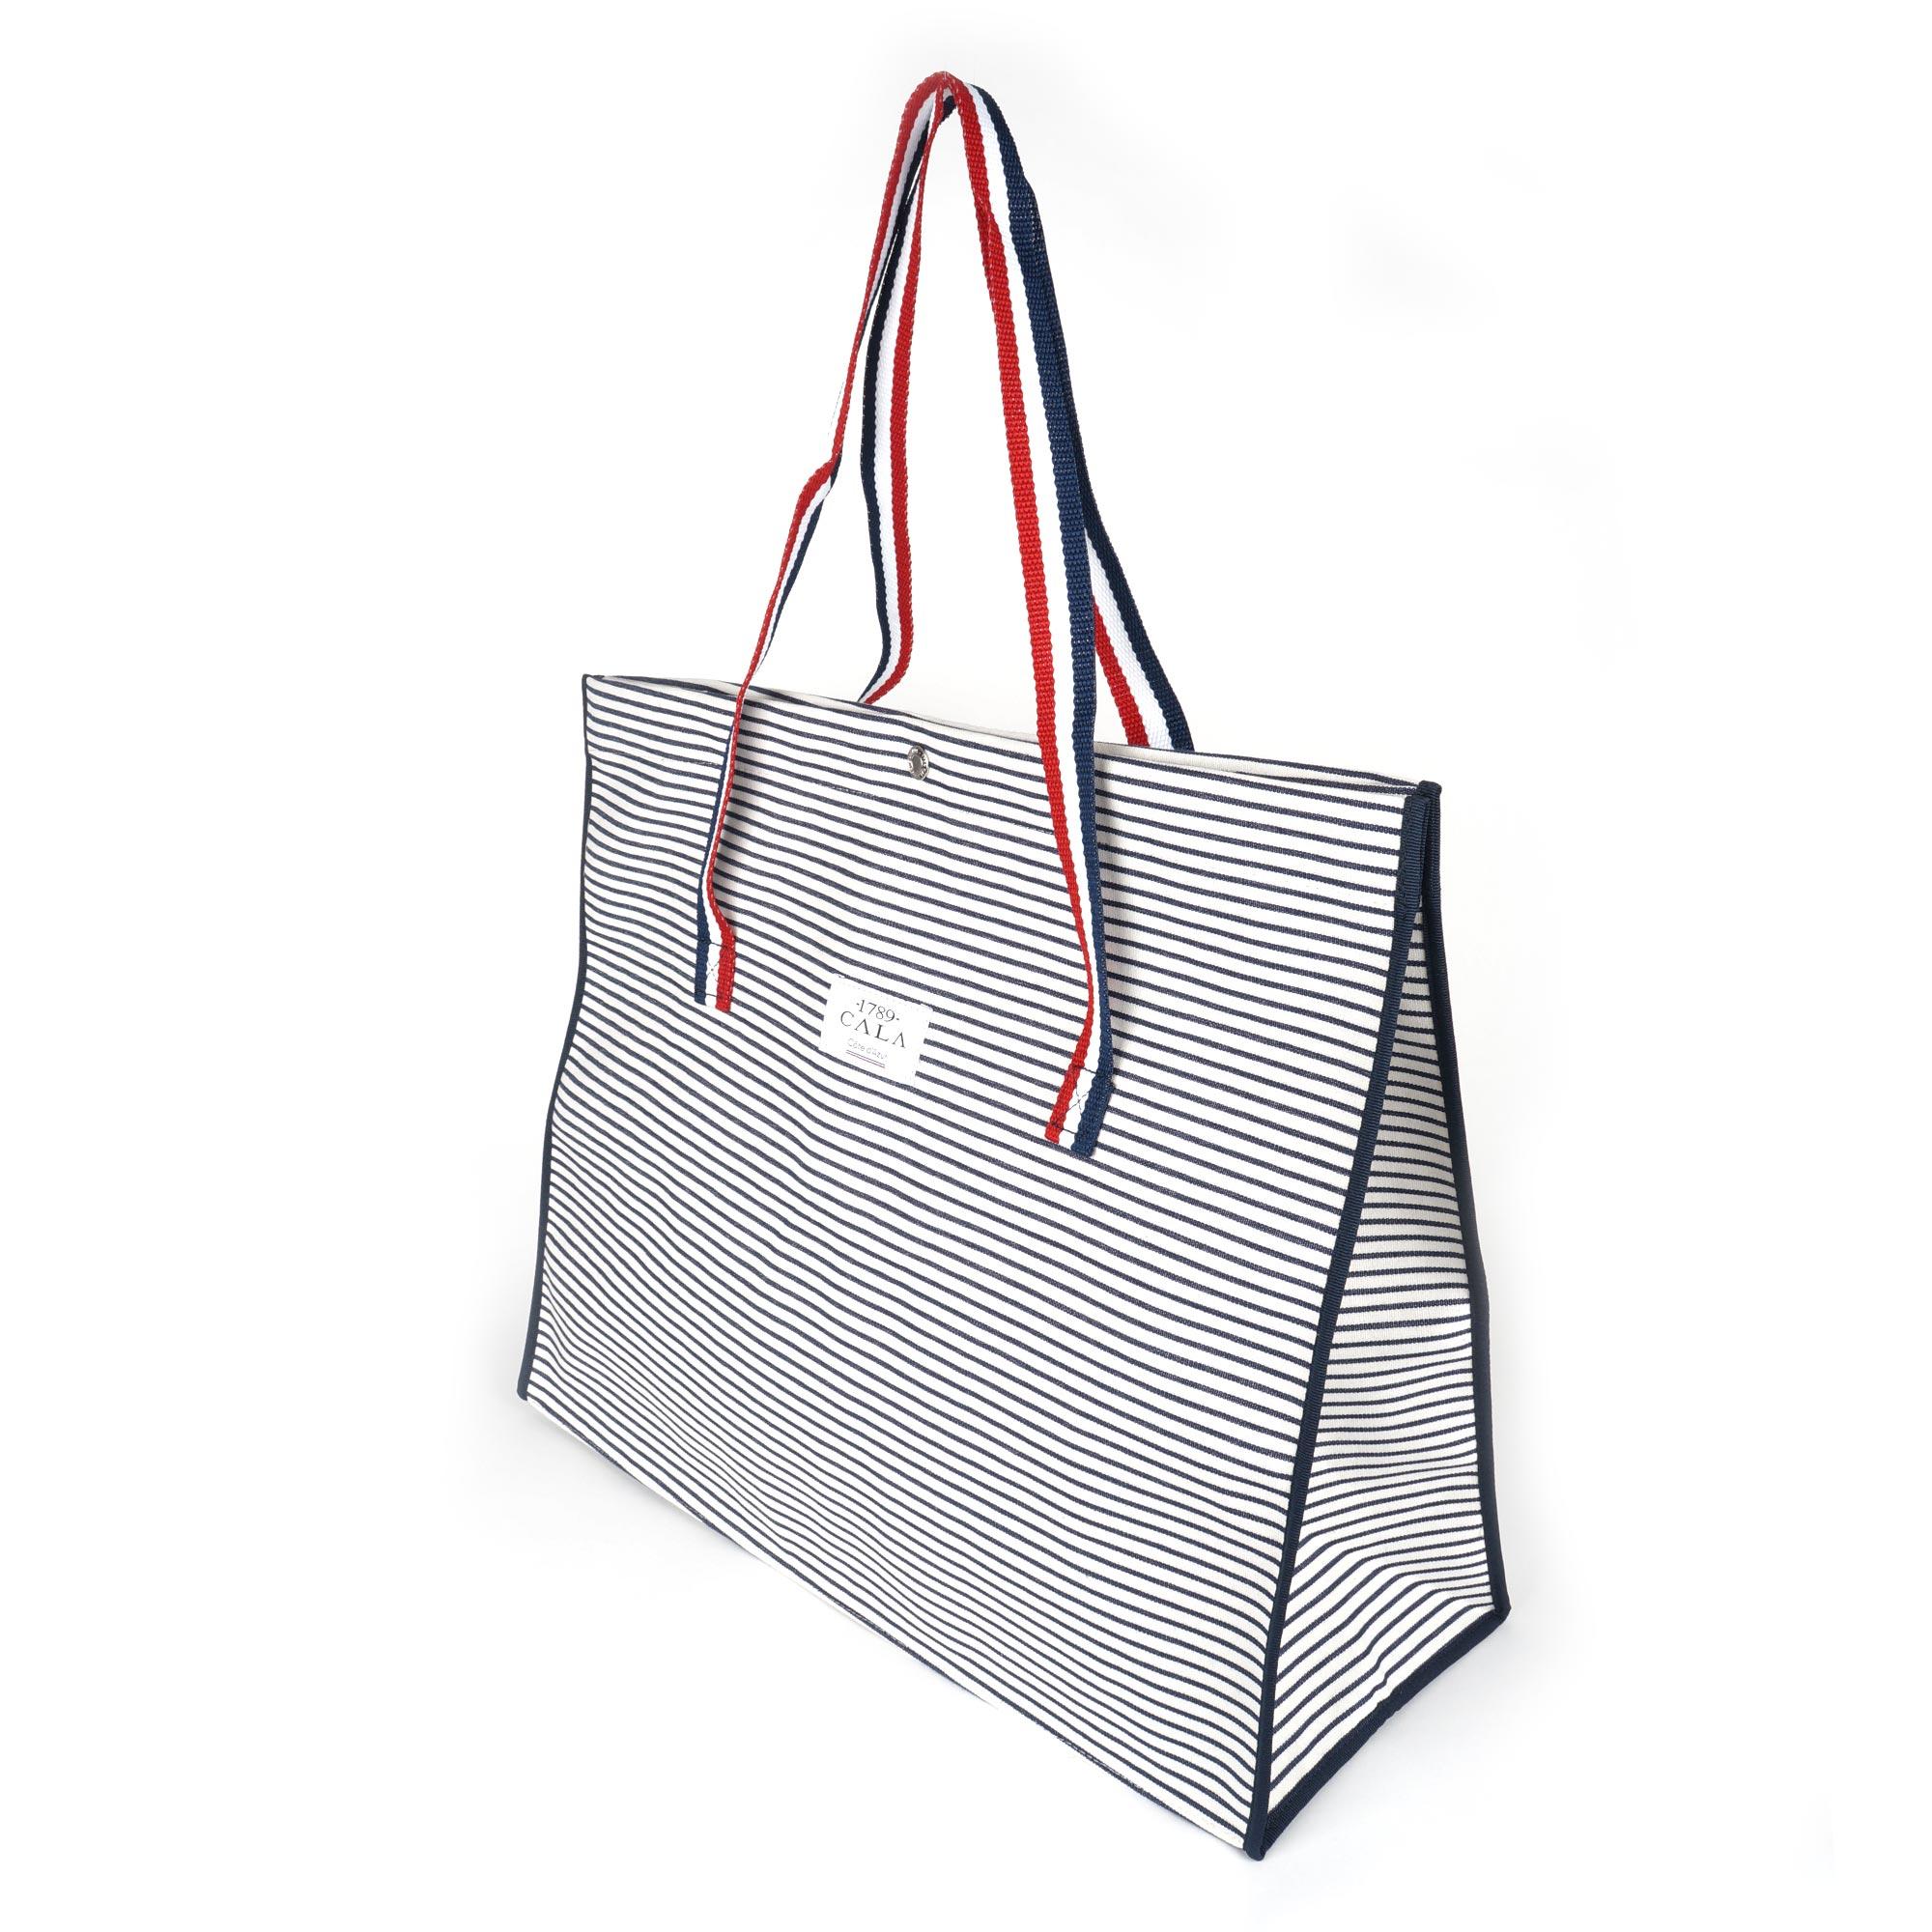 sac cabas en toile coton ray e bleu marine cabas plage rayures marine. Black Bedroom Furniture Sets. Home Design Ideas